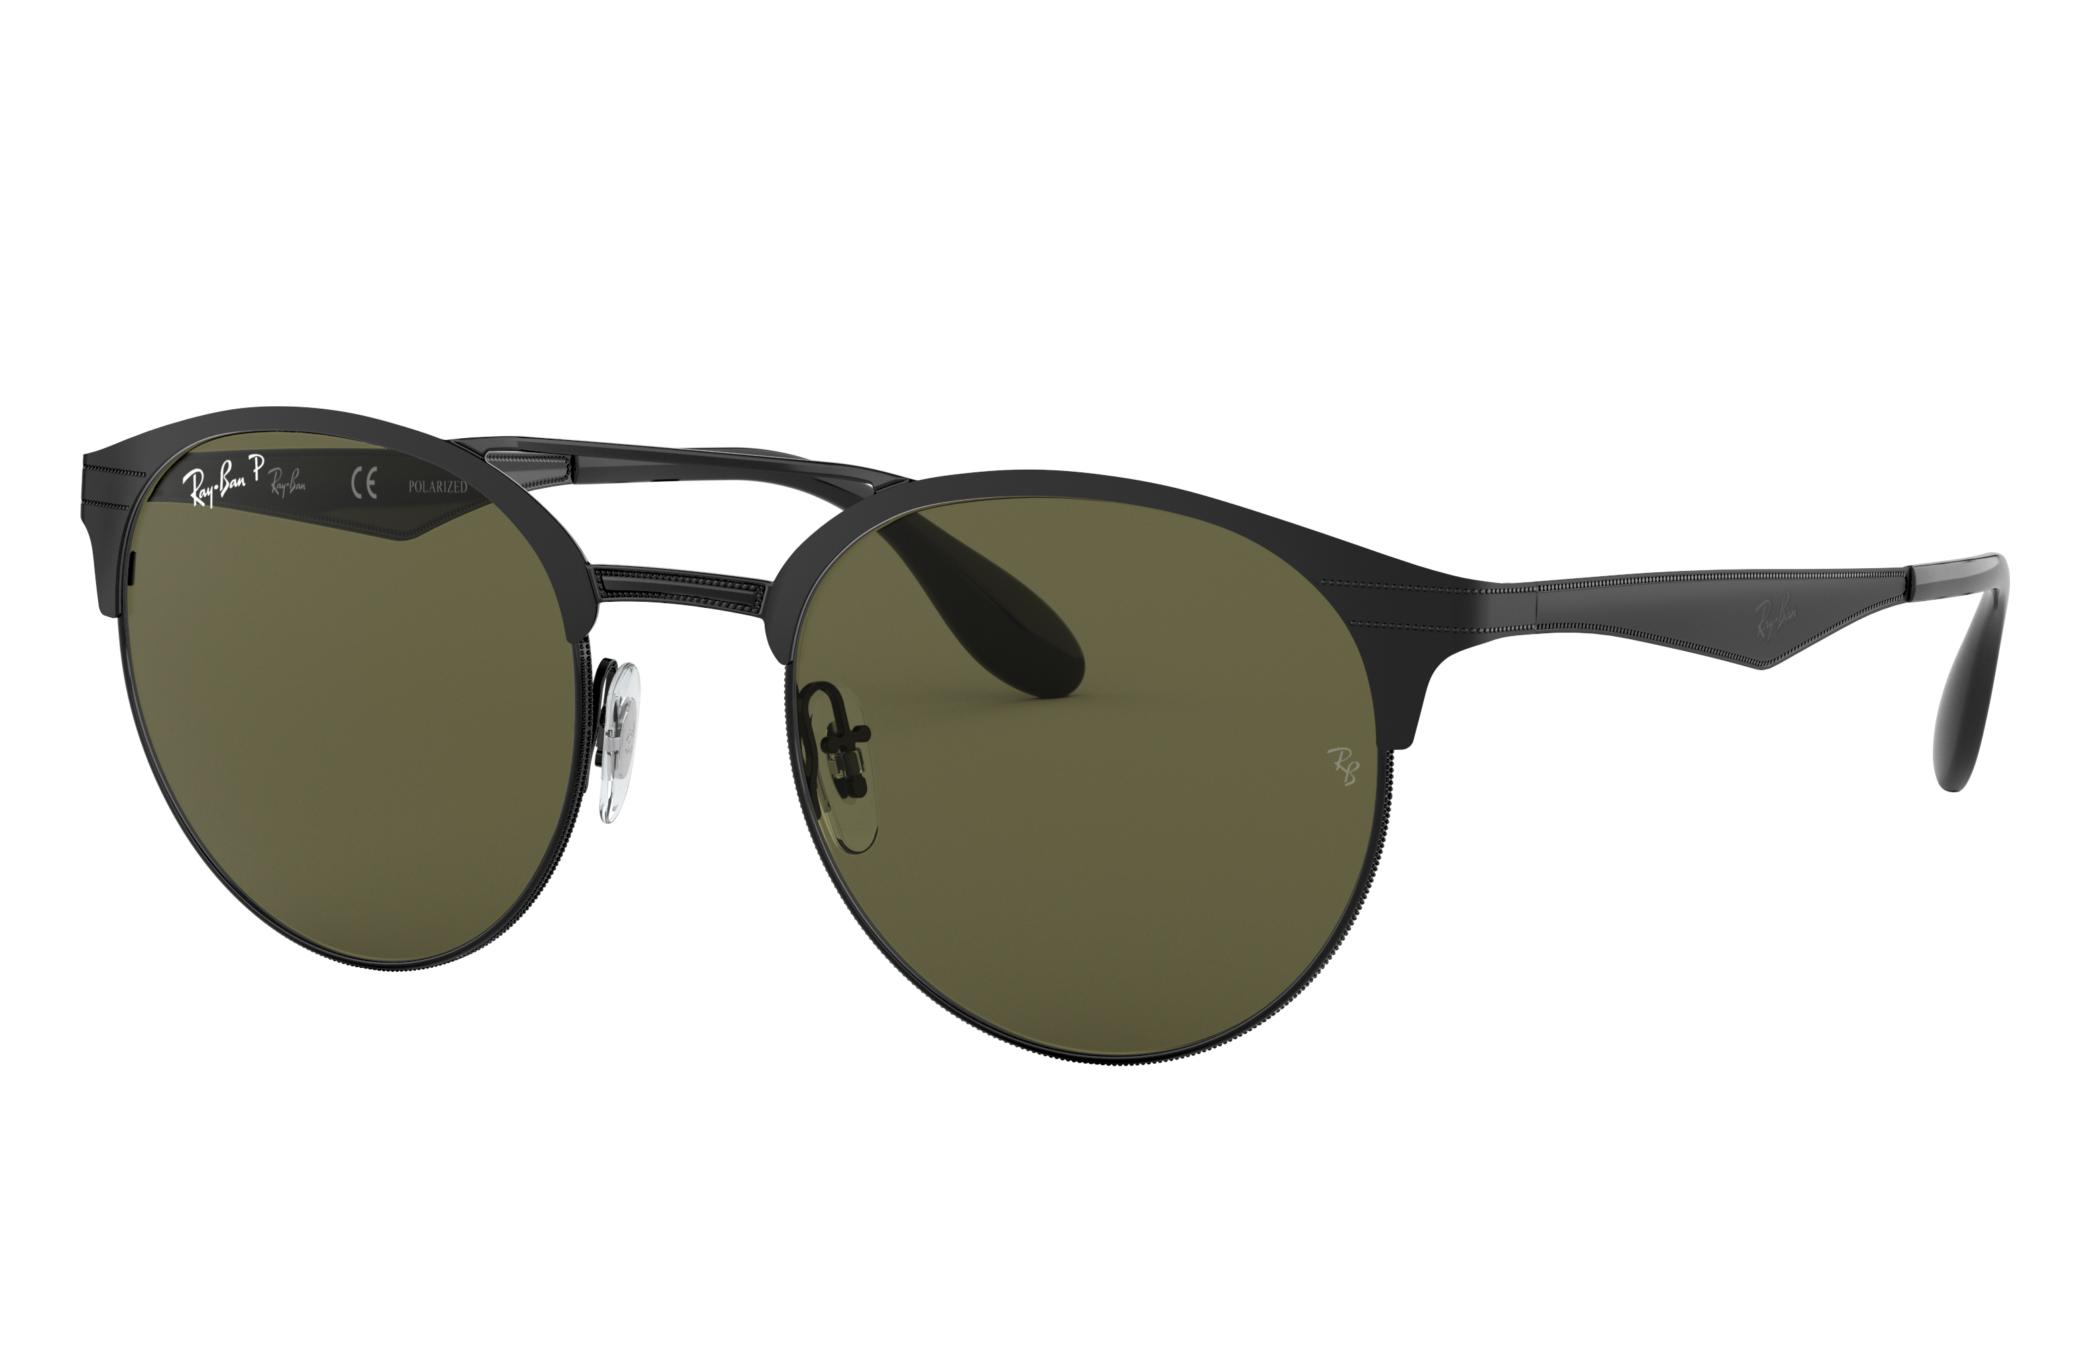 Ray-Ban Rb3545 Black, Polarized Green Lenses - RB3545